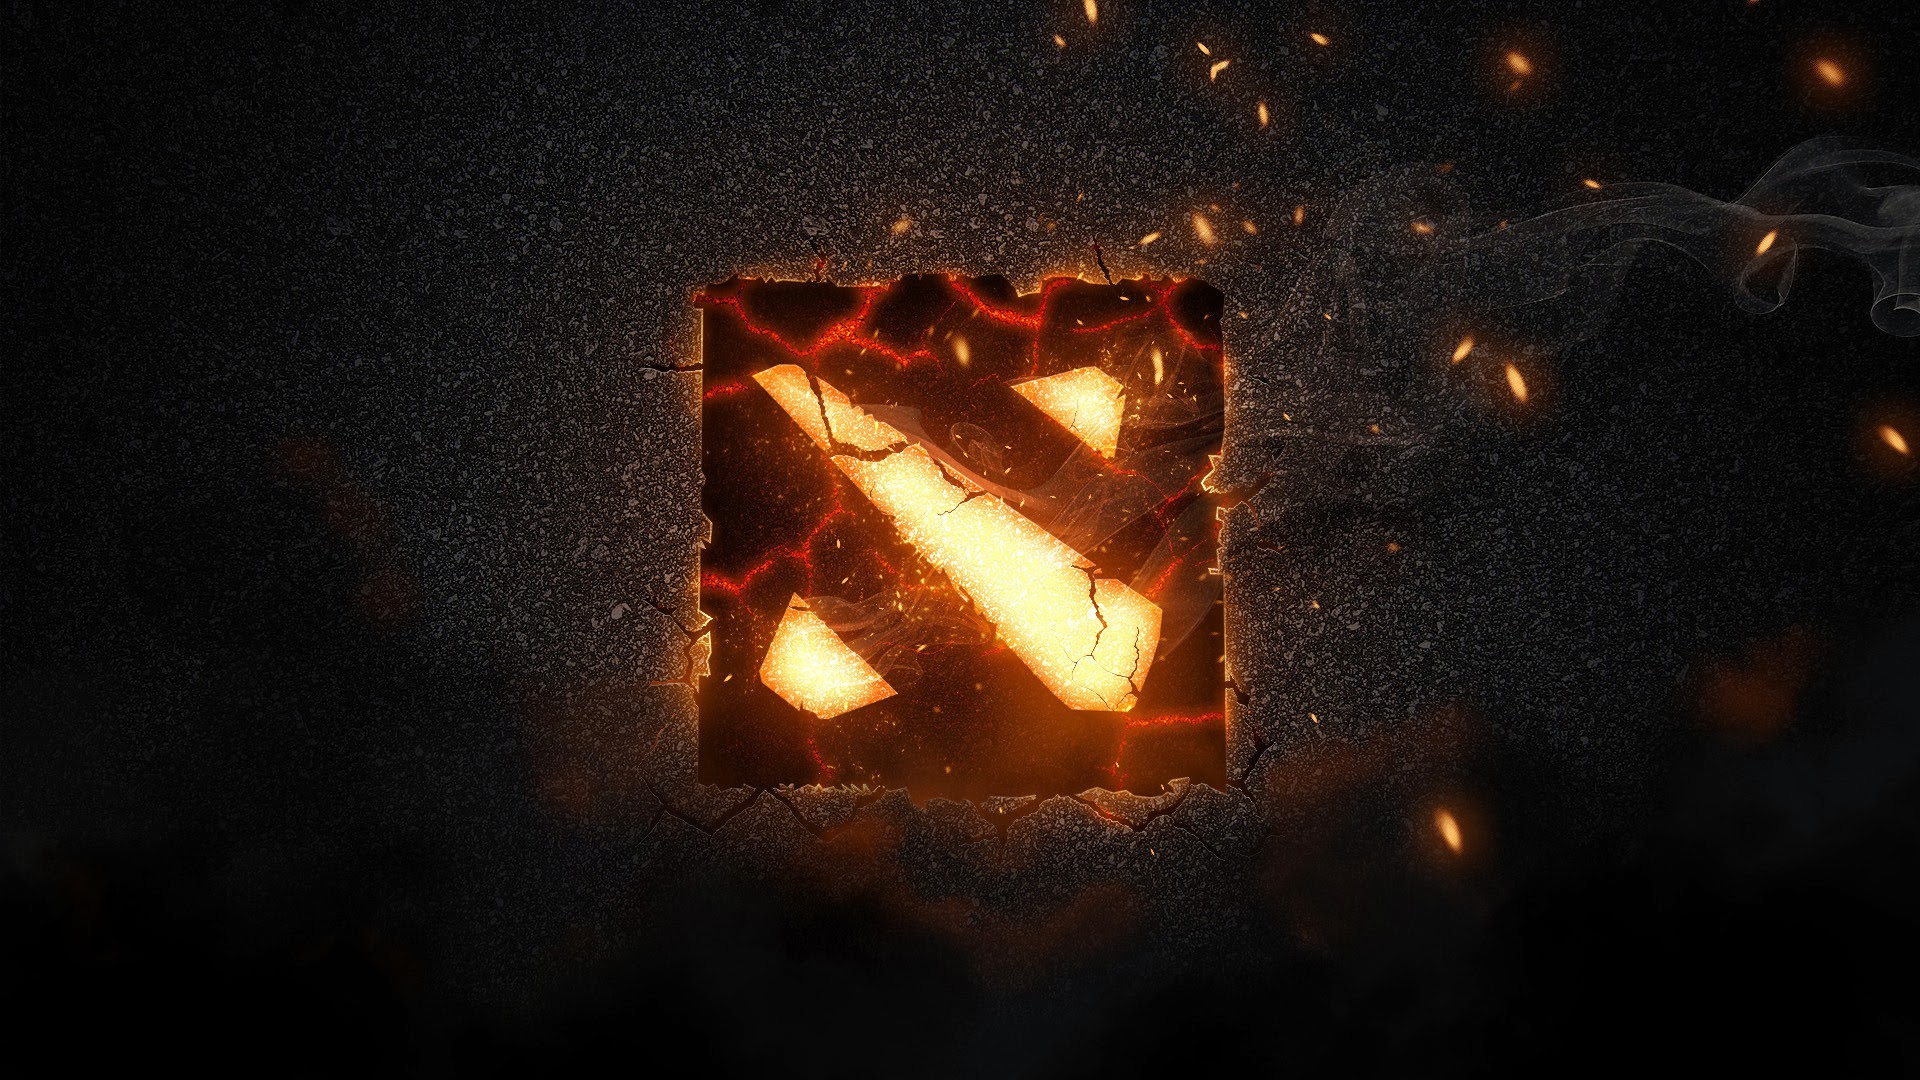 dota 2 logo flaming hd wallpaper game 1920x1080 a587 1920x1080